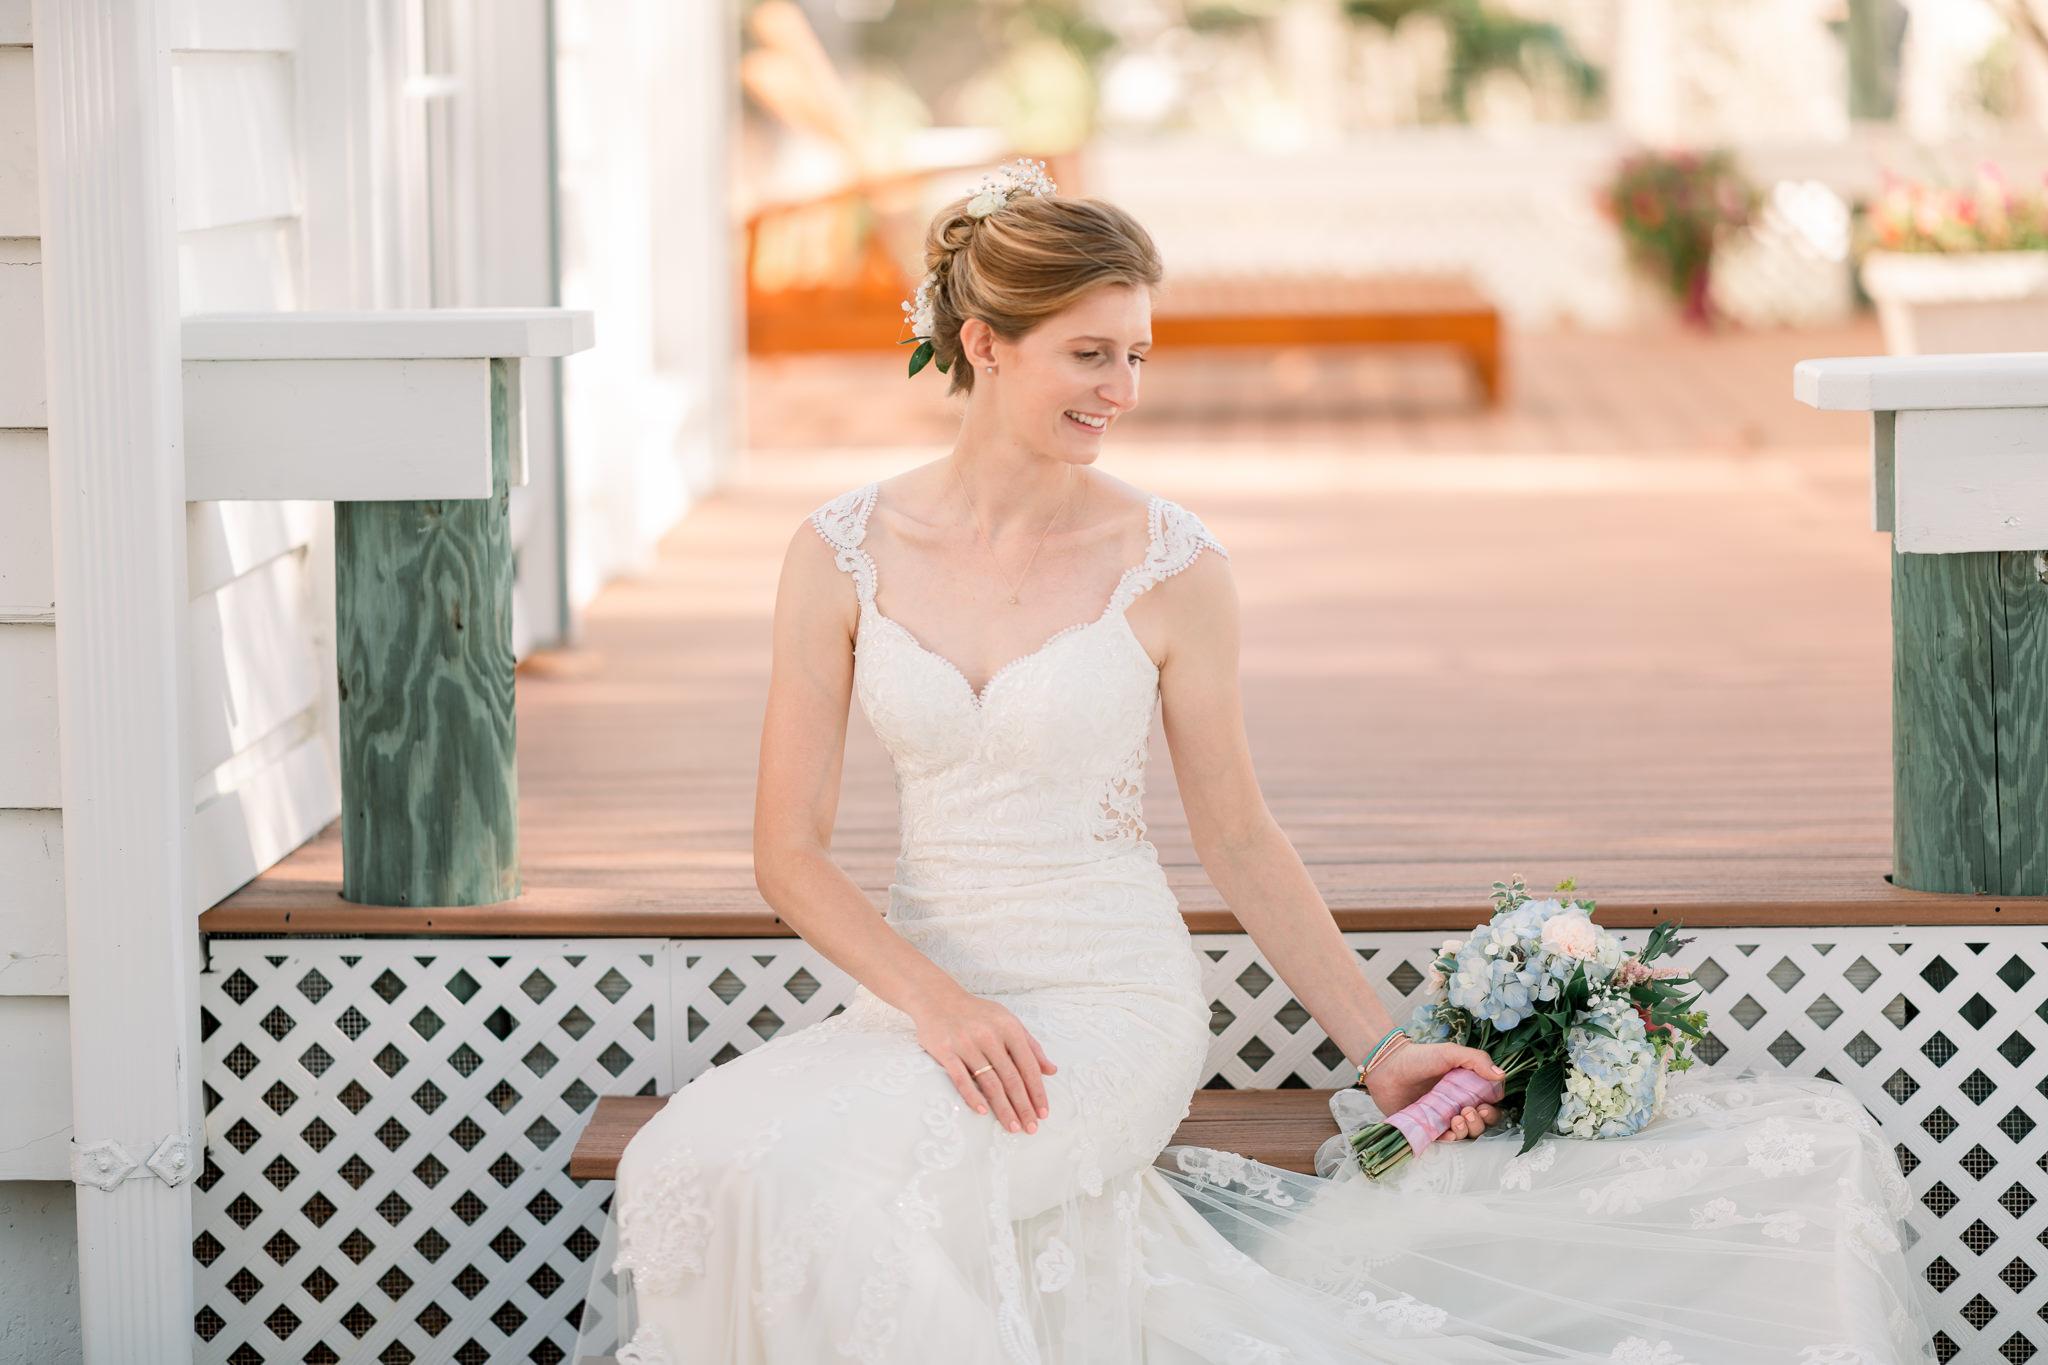 SARASOTA_WEDDING_PHOTOGRAPHY_SMMZ_7630.jpg